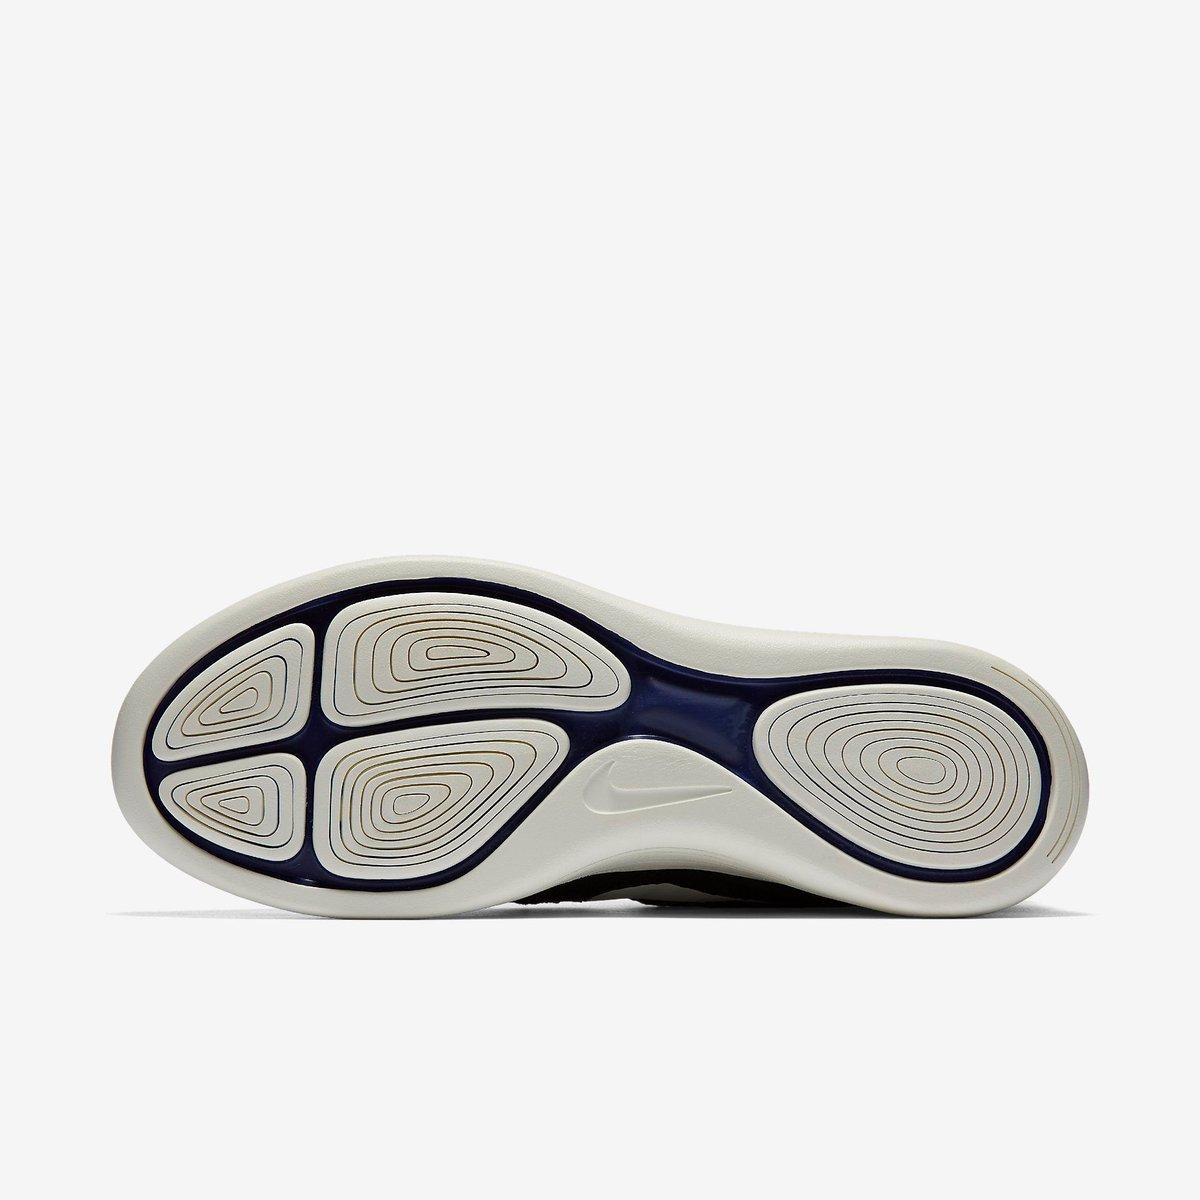 3f67212aaab1 Gyakusou x NikeLab Lunarepic Low Flyknit 2 Available now  Black  https